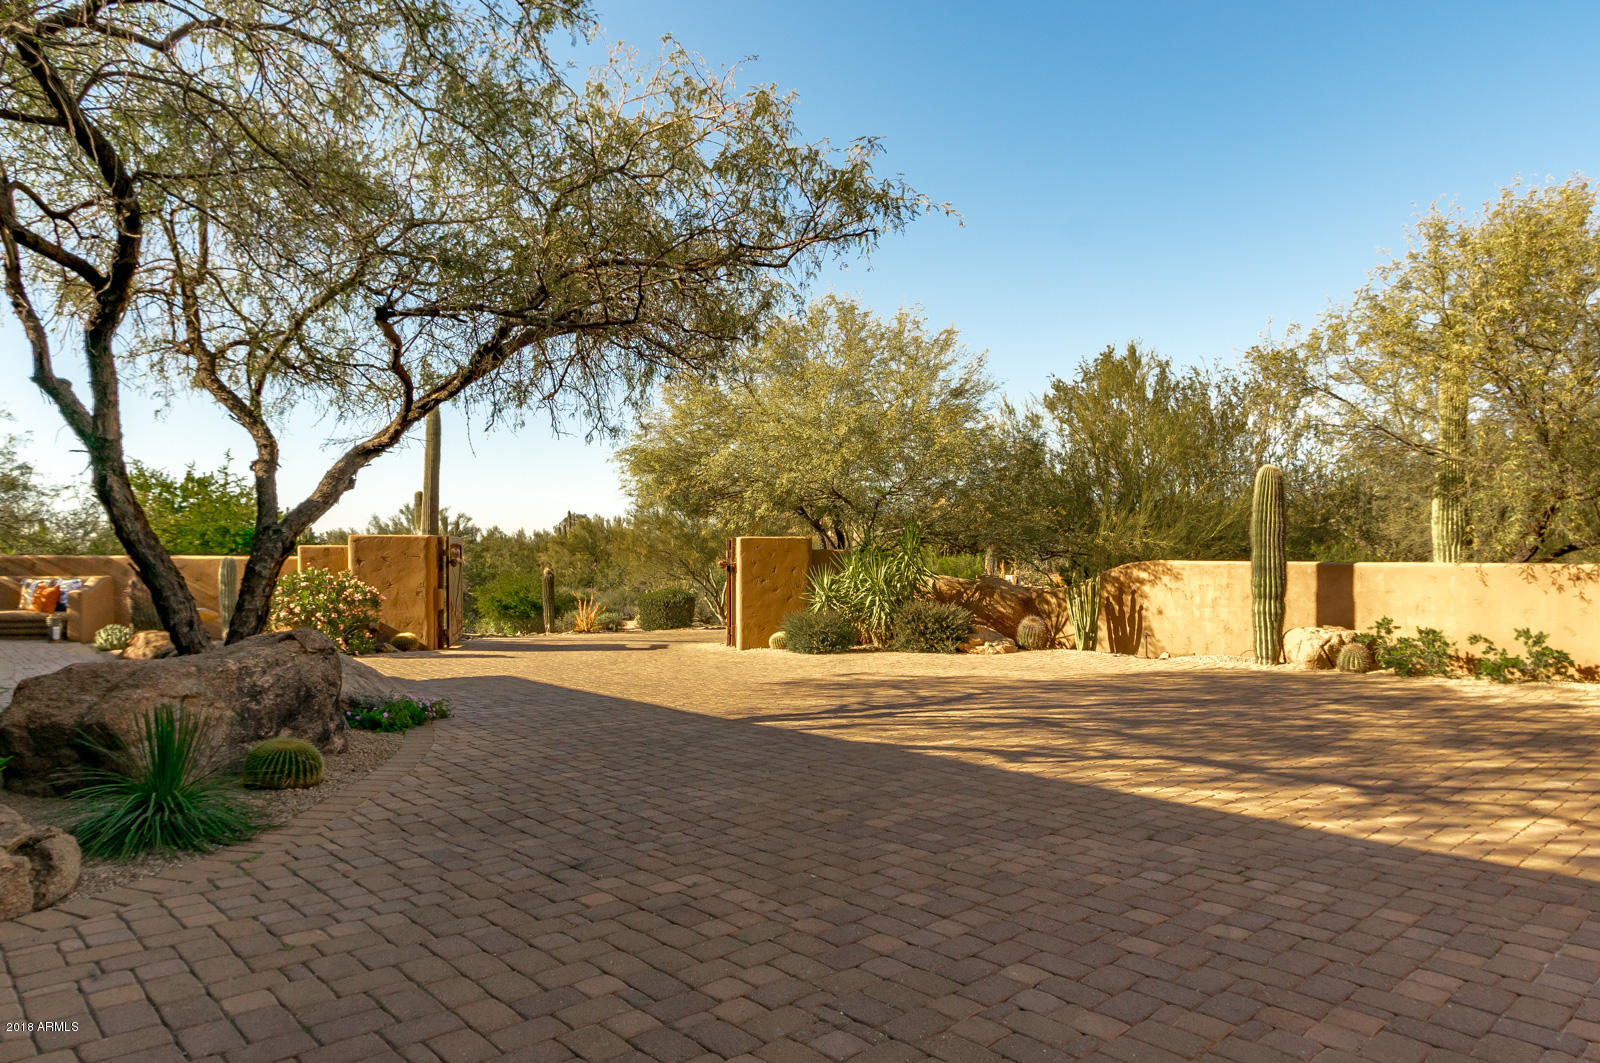 MLS 5854903 7289 E LOWER WASH Pass, Scottsdale, AZ 85266 Scottsdale AZ Whisper Rock